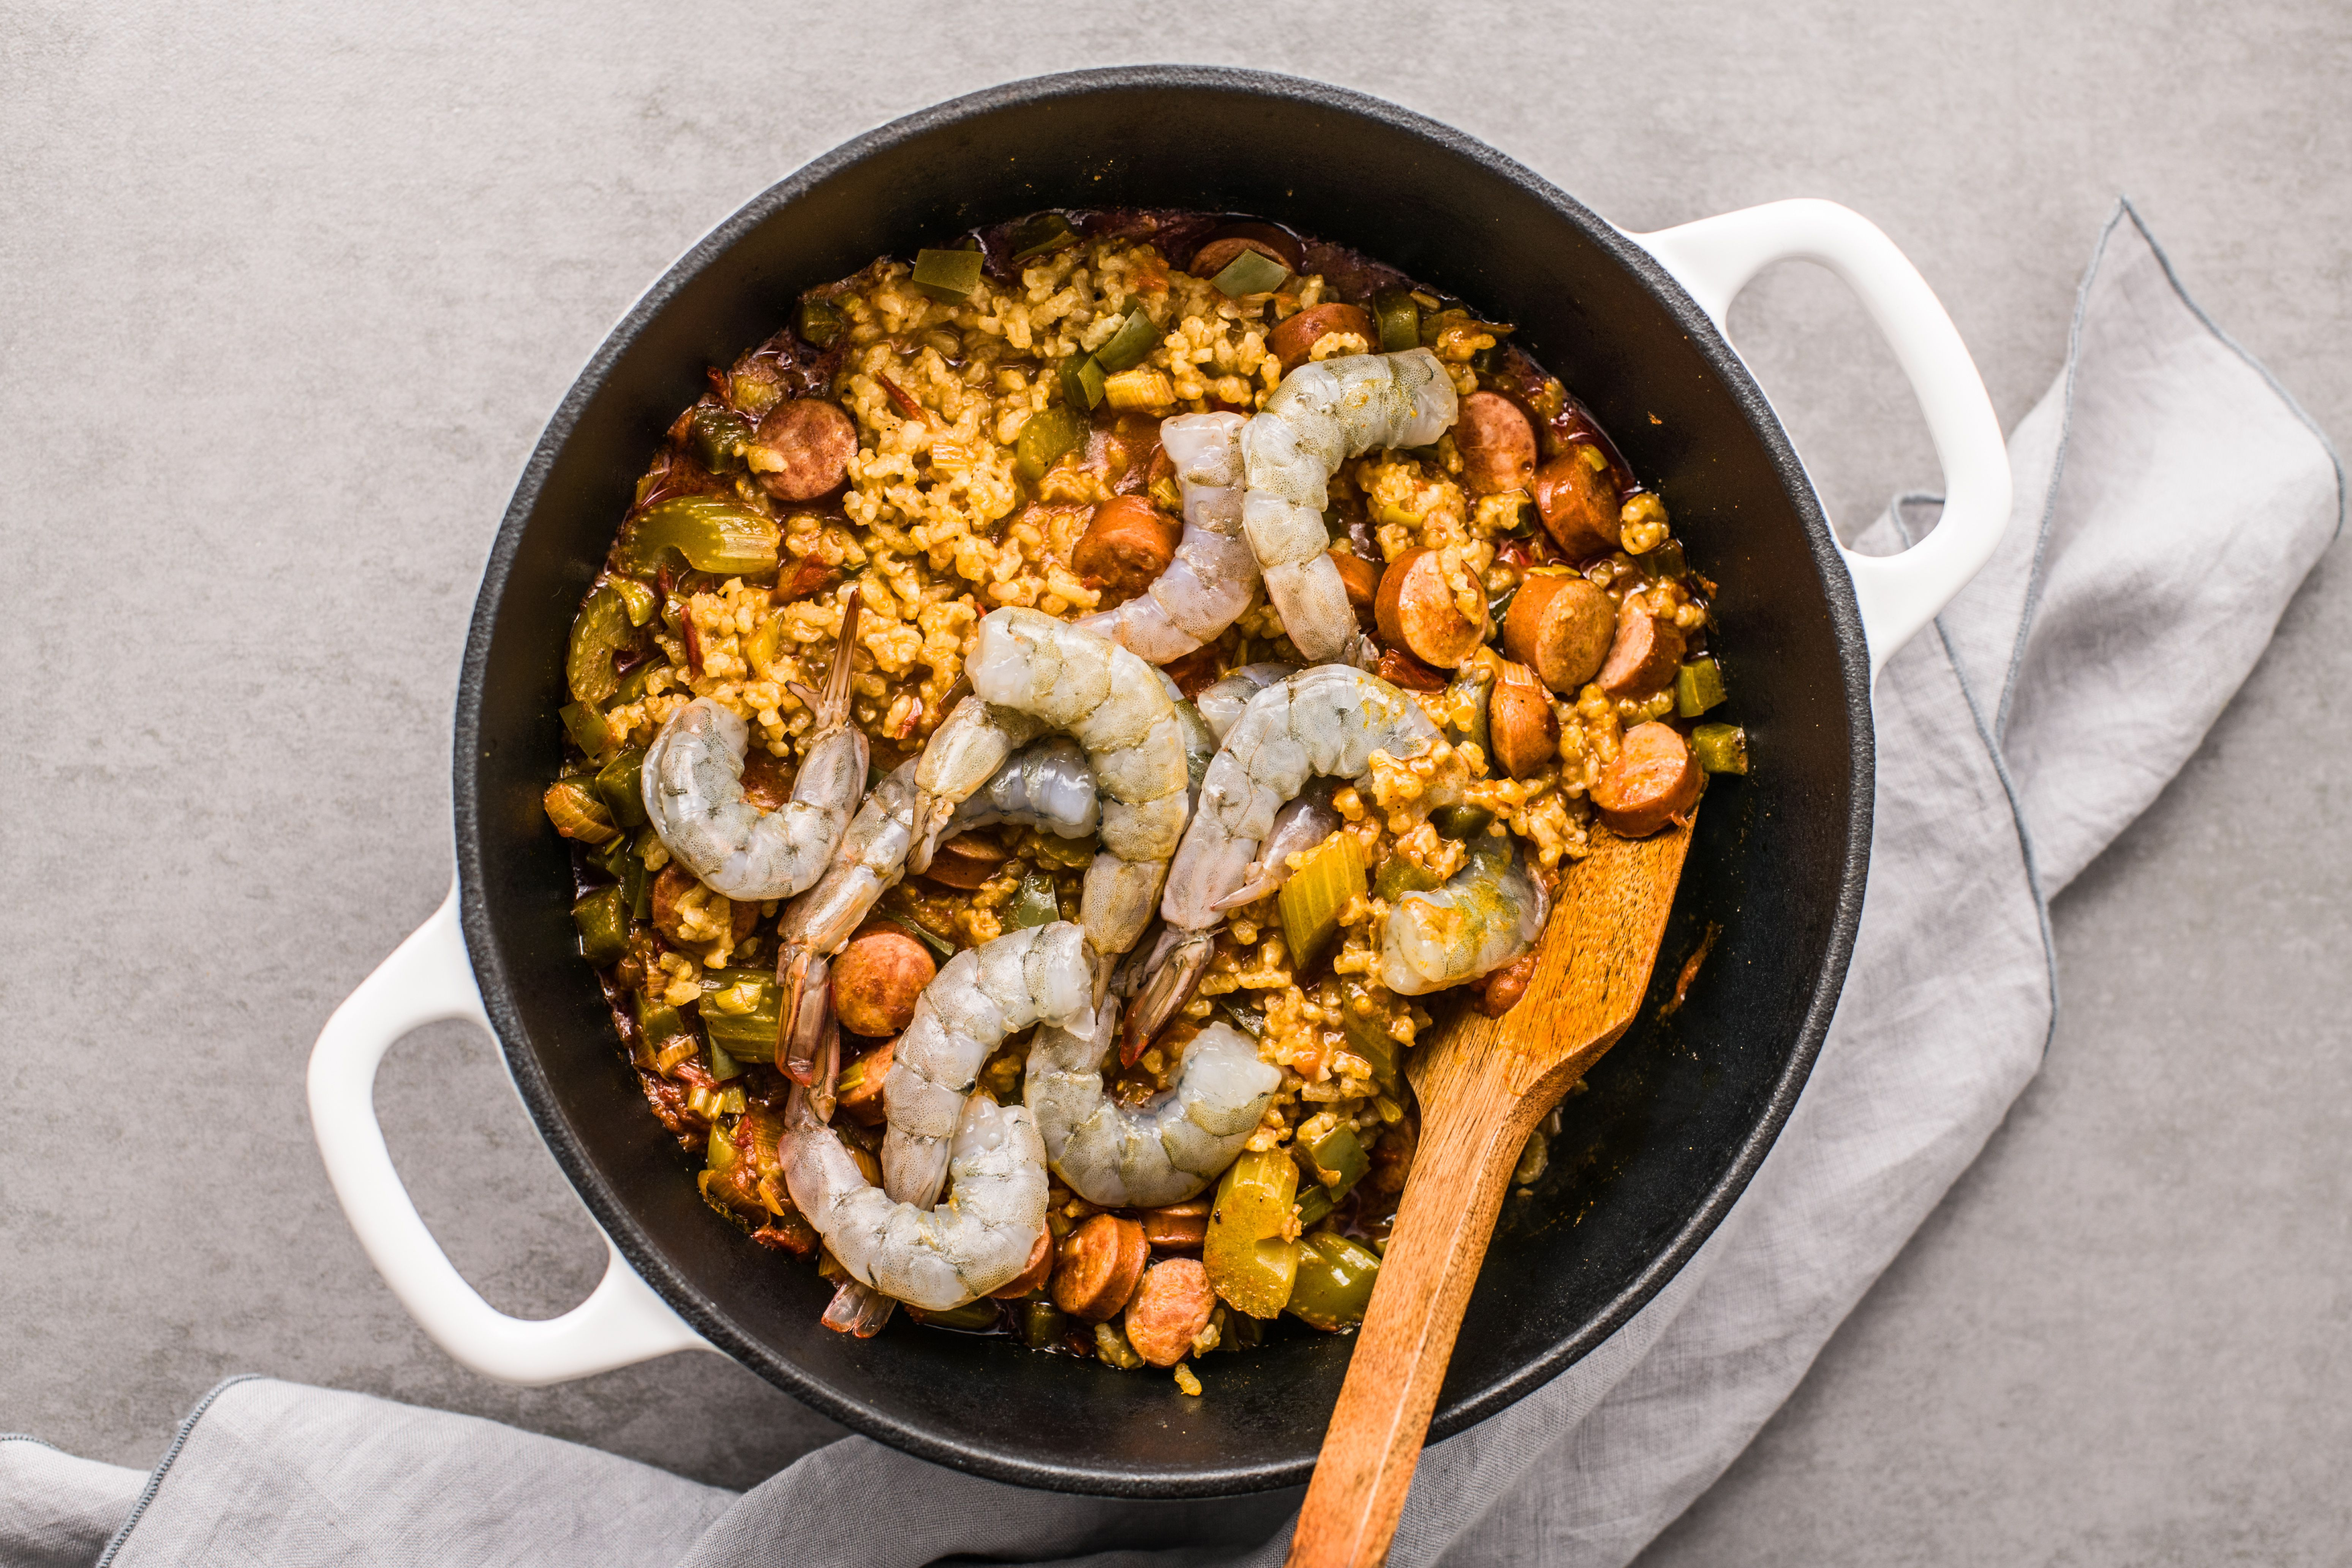 Stir in shrimp